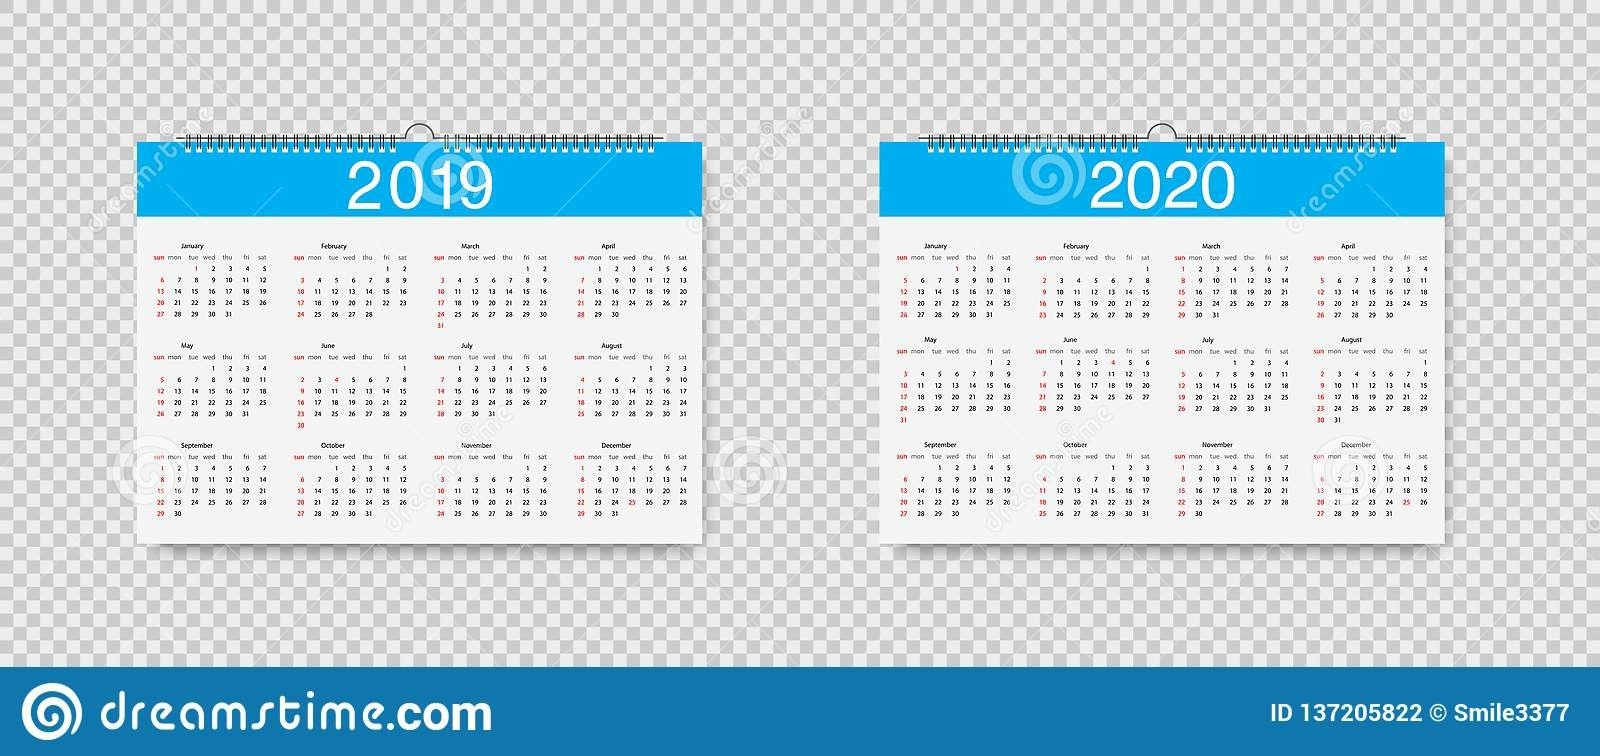 Shift Calendar 2021 Free | Calendar Template Printable